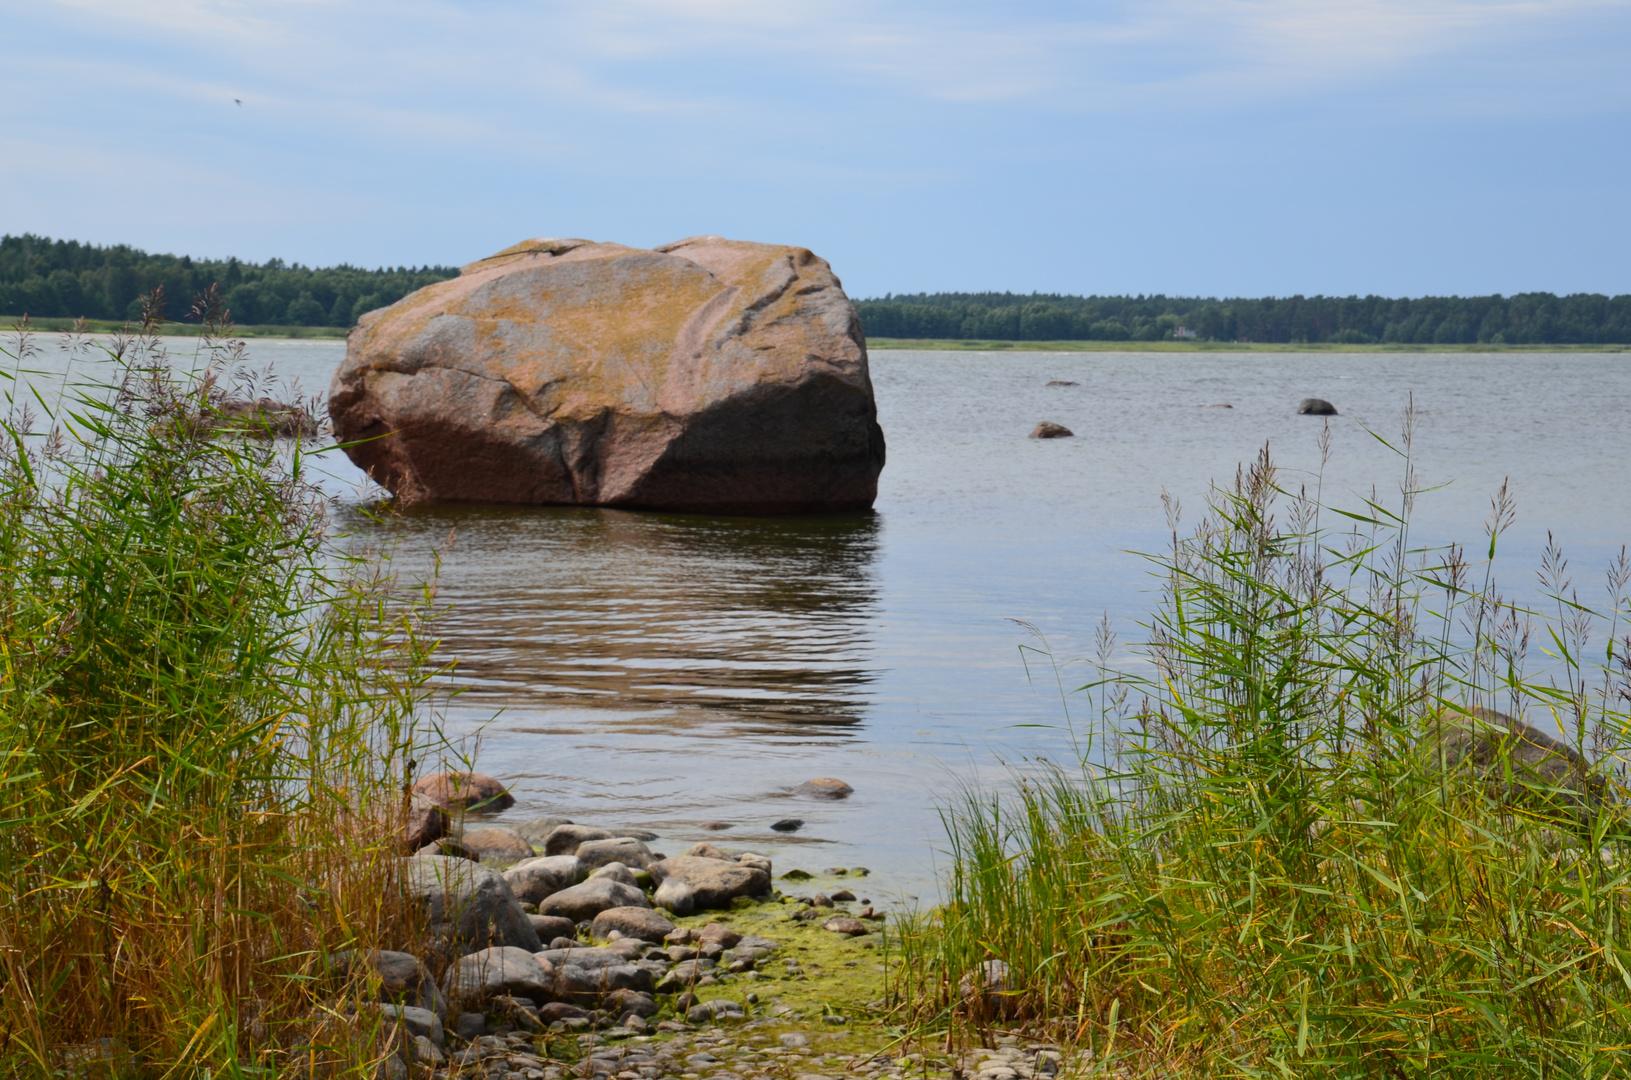 Altja - Findlinge in der Bucht (Juli 2013)